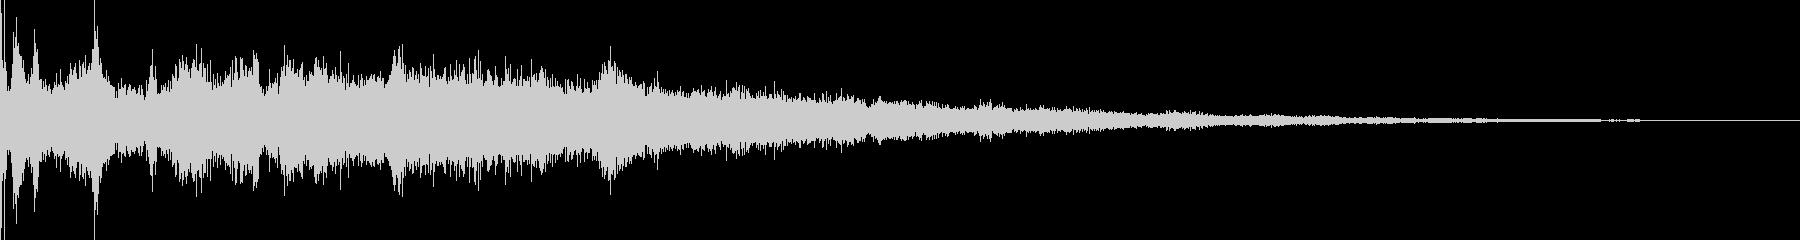 氷魔法02(冷気属性魔法)の未再生の波形